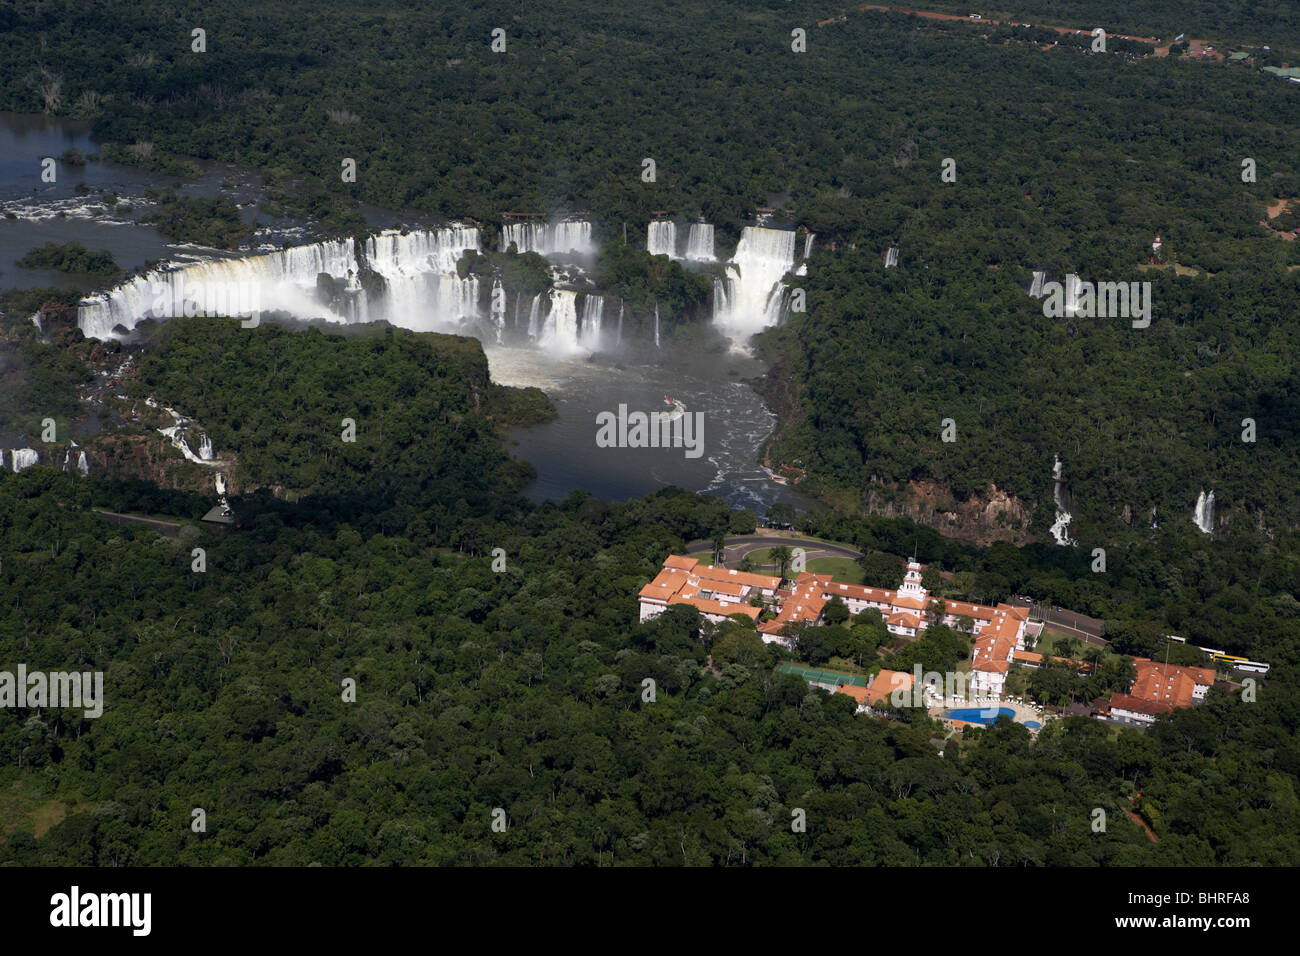 aerial view of iguazu falls and the hotel das cataratas brazilian side of iguacu national park, parana, brazil, Stock Photo